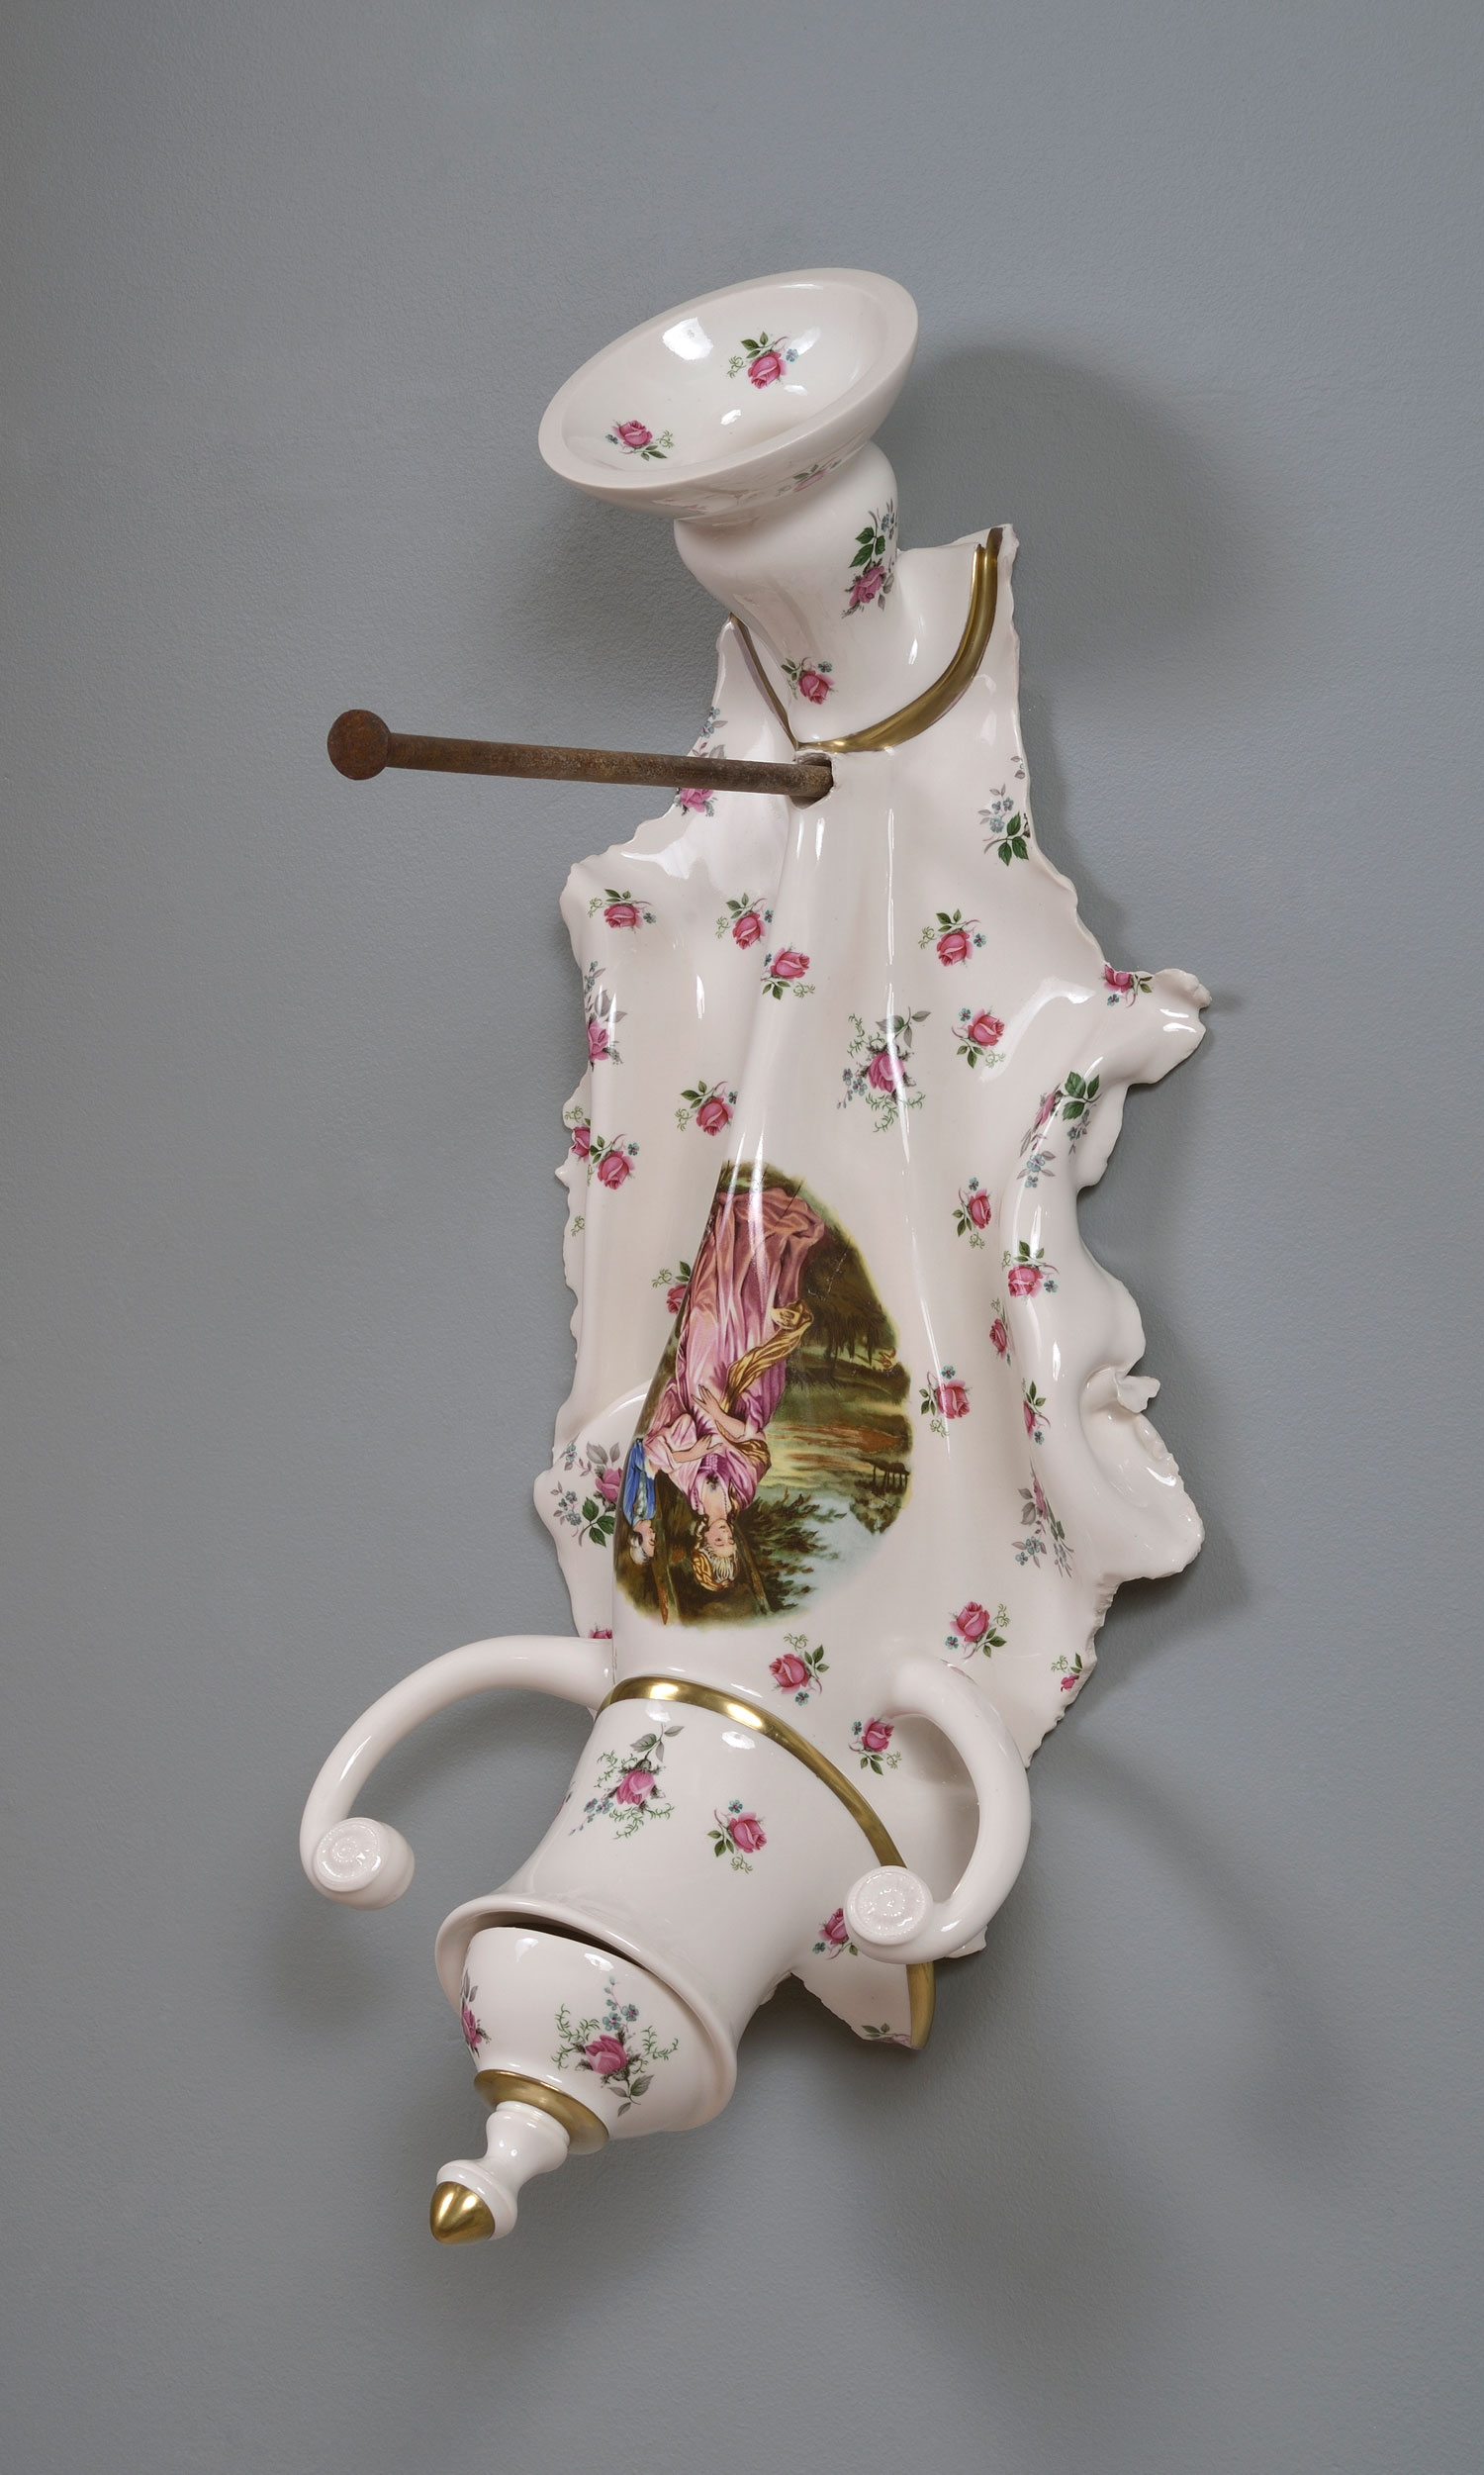 Laurent Craste Porcelain Art   Yellowtrace